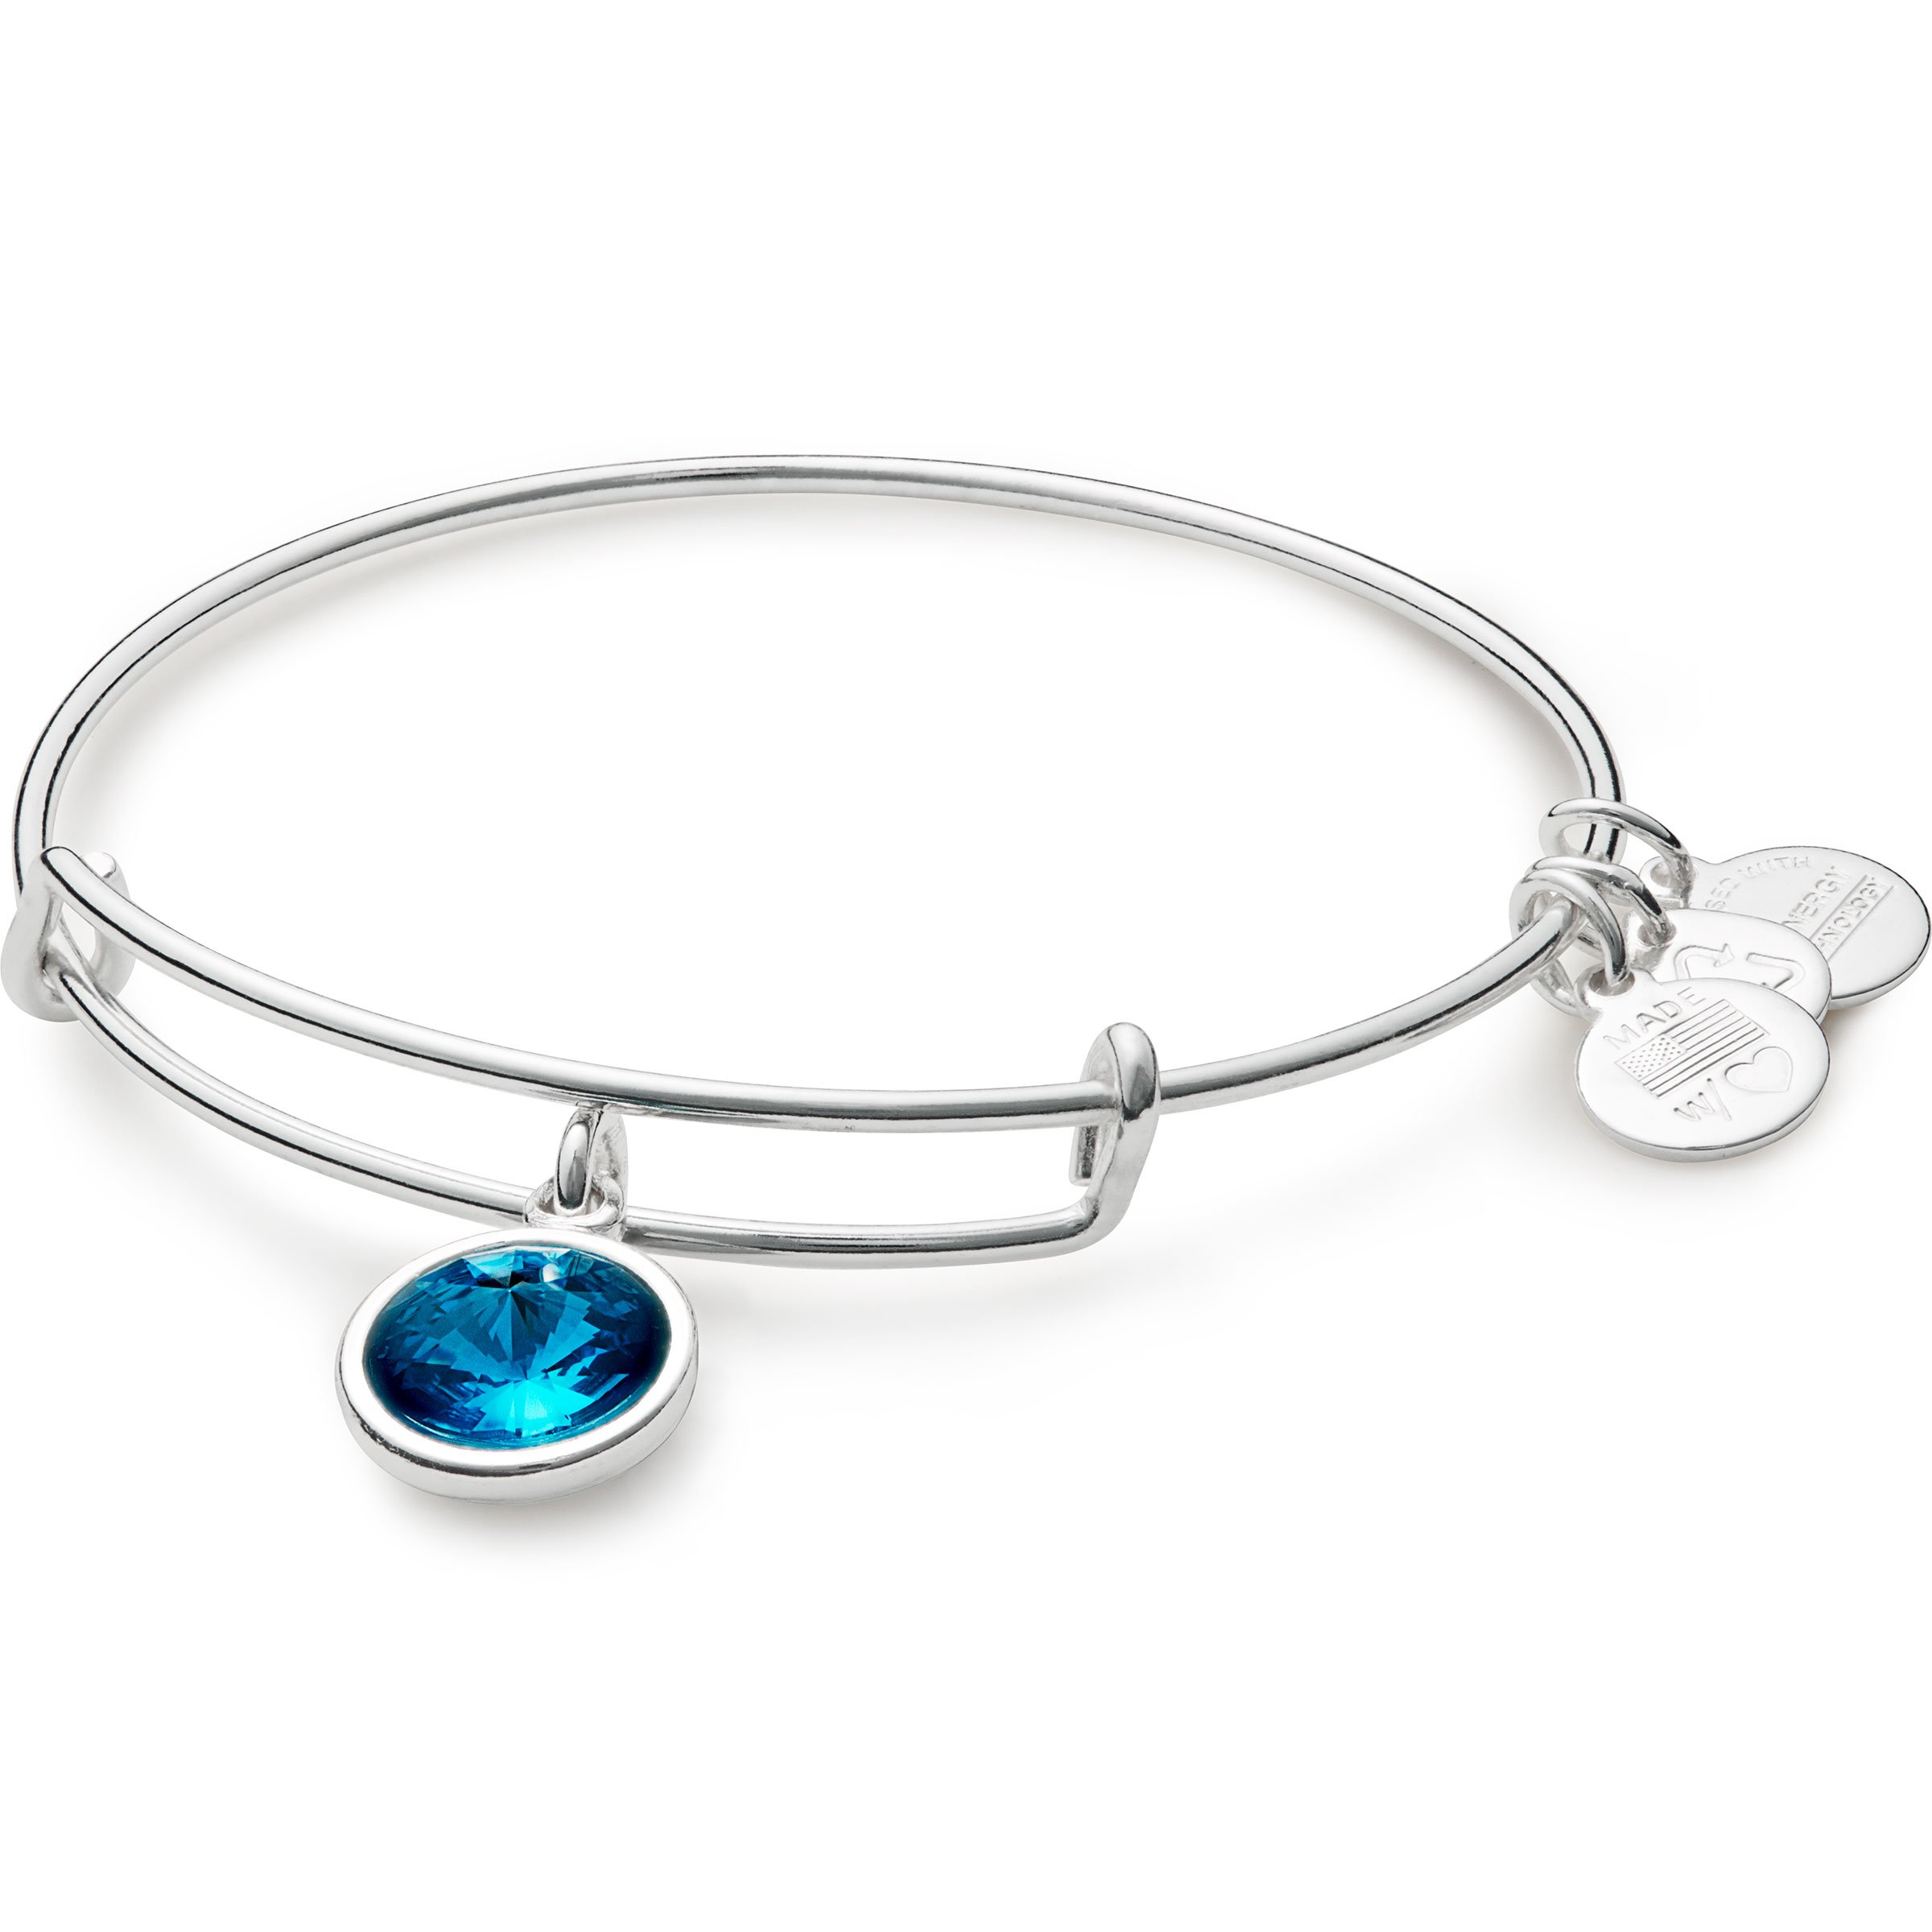 Alex and Ani ''Bangle Bar'' December Imitation Birthstone Shiny-Silver Tone Expandable Bracelet